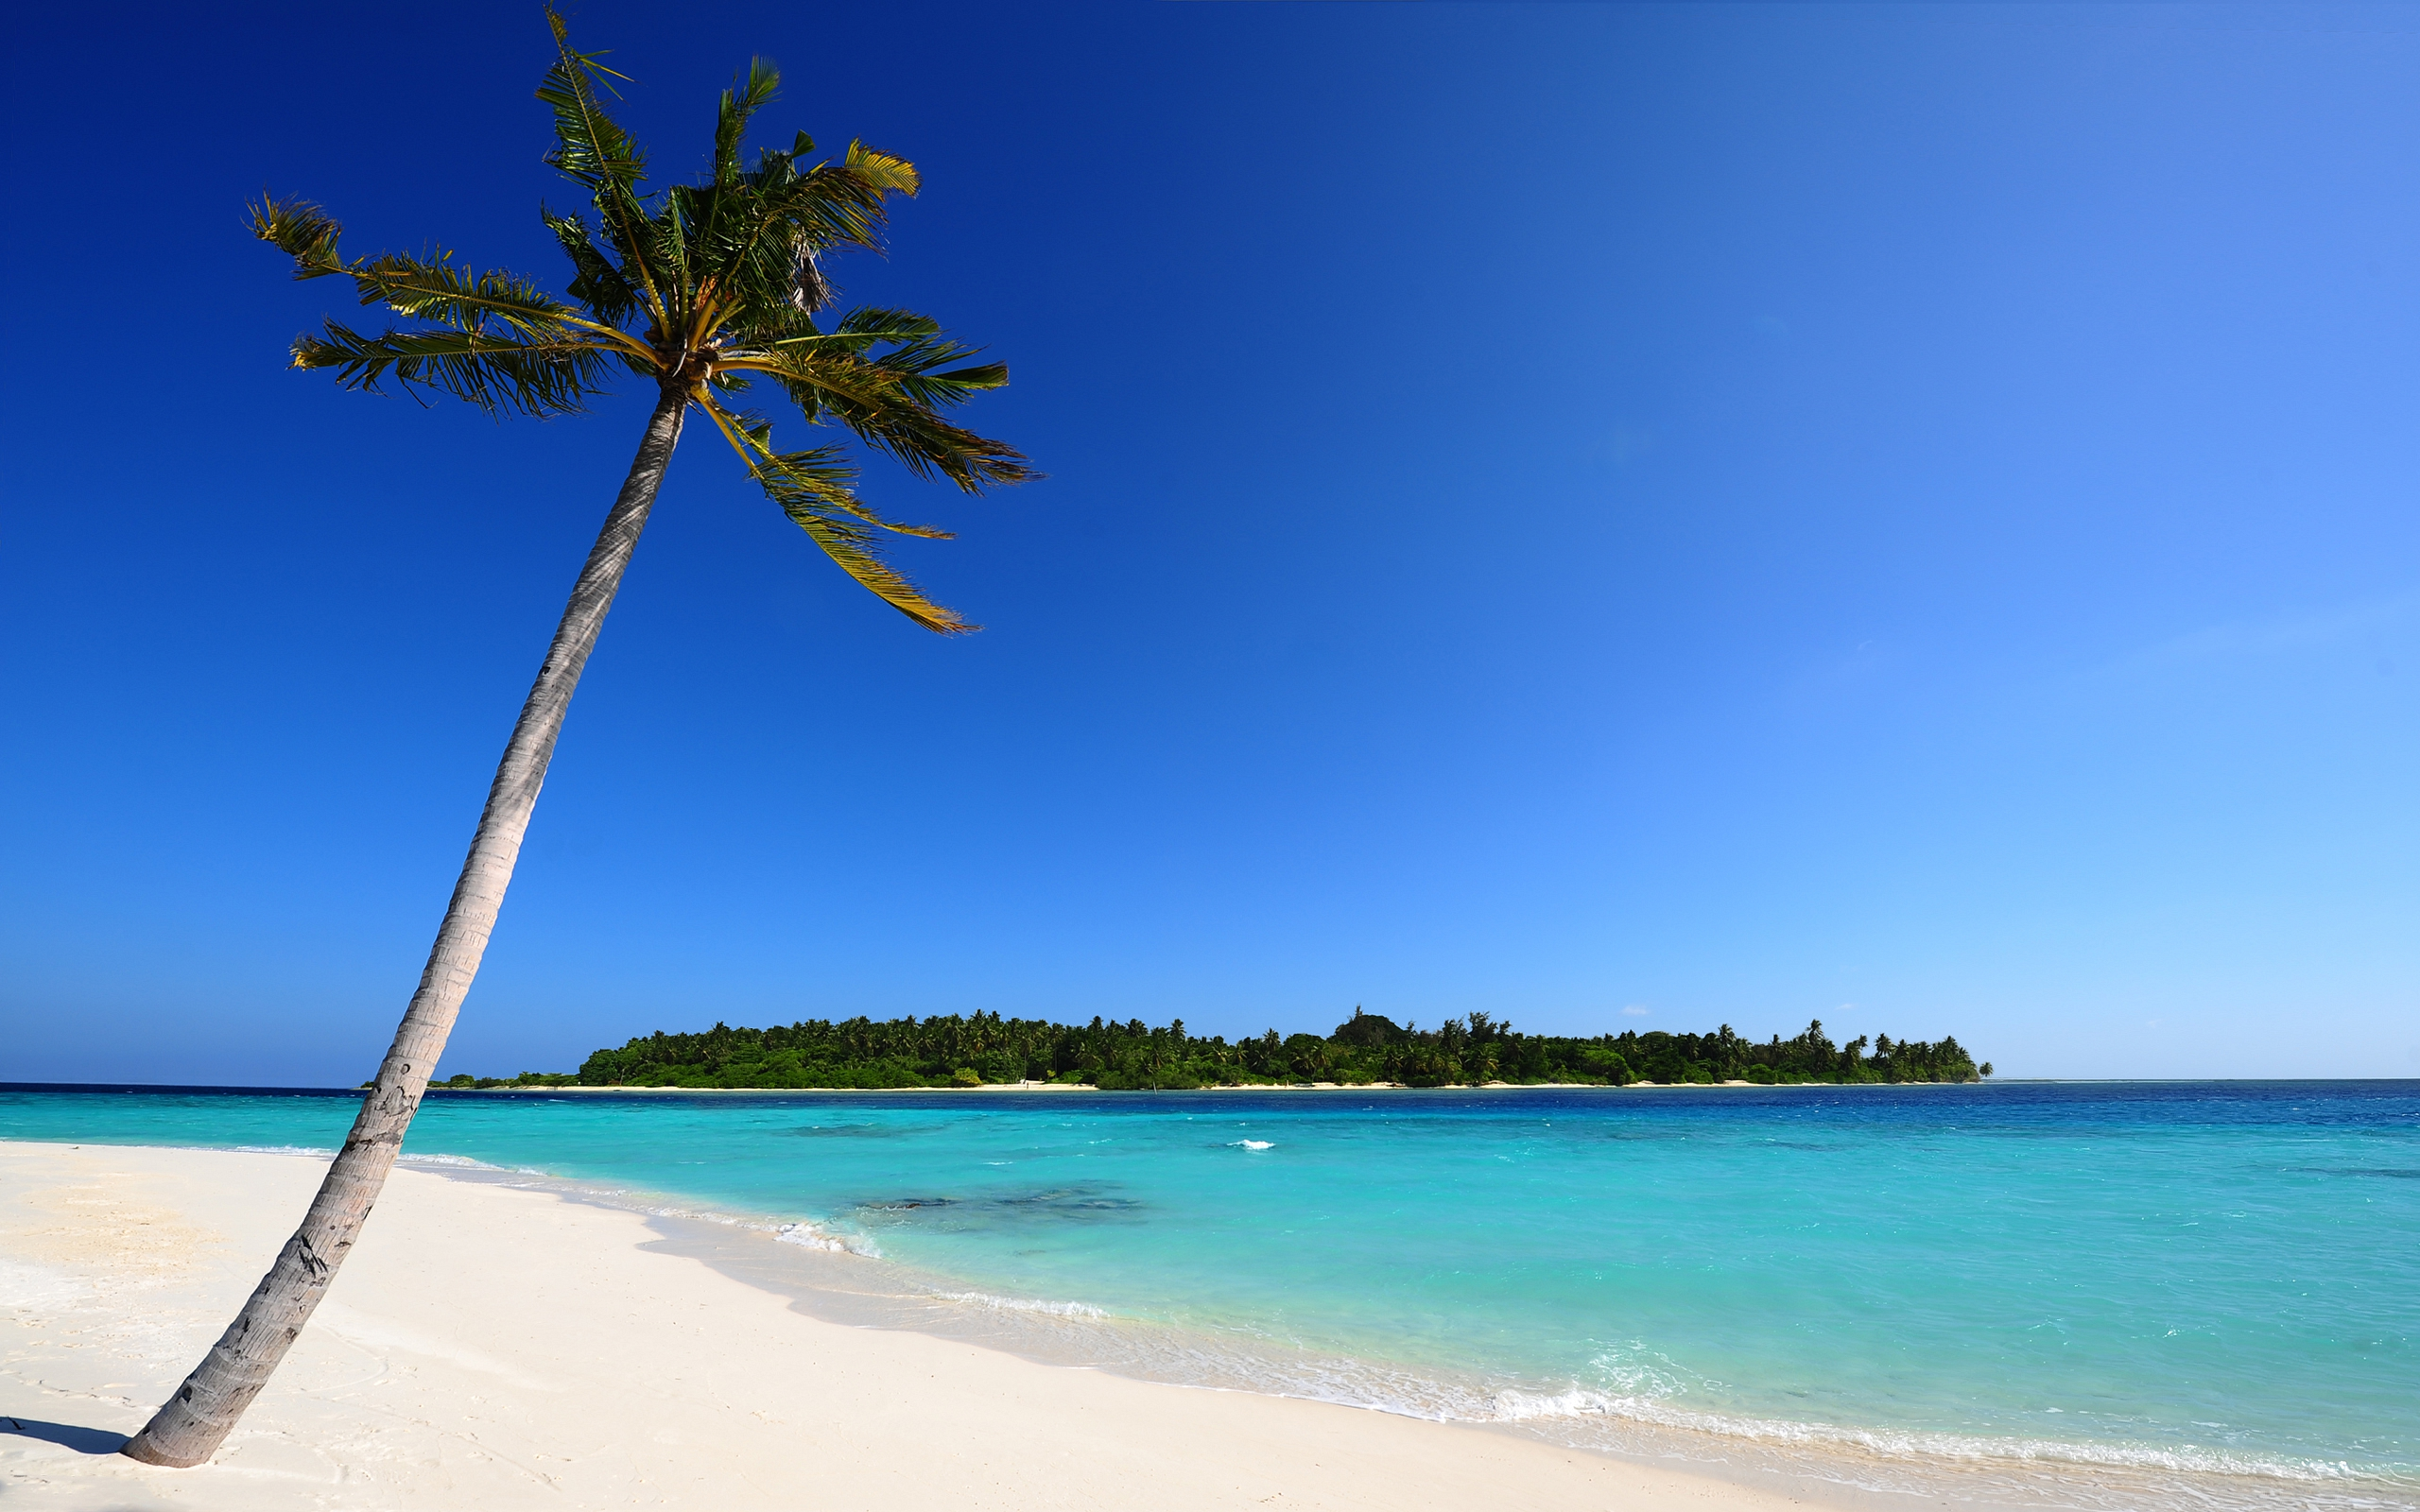 beach backgrounds beach powerpoint templates beach background 2560x1600